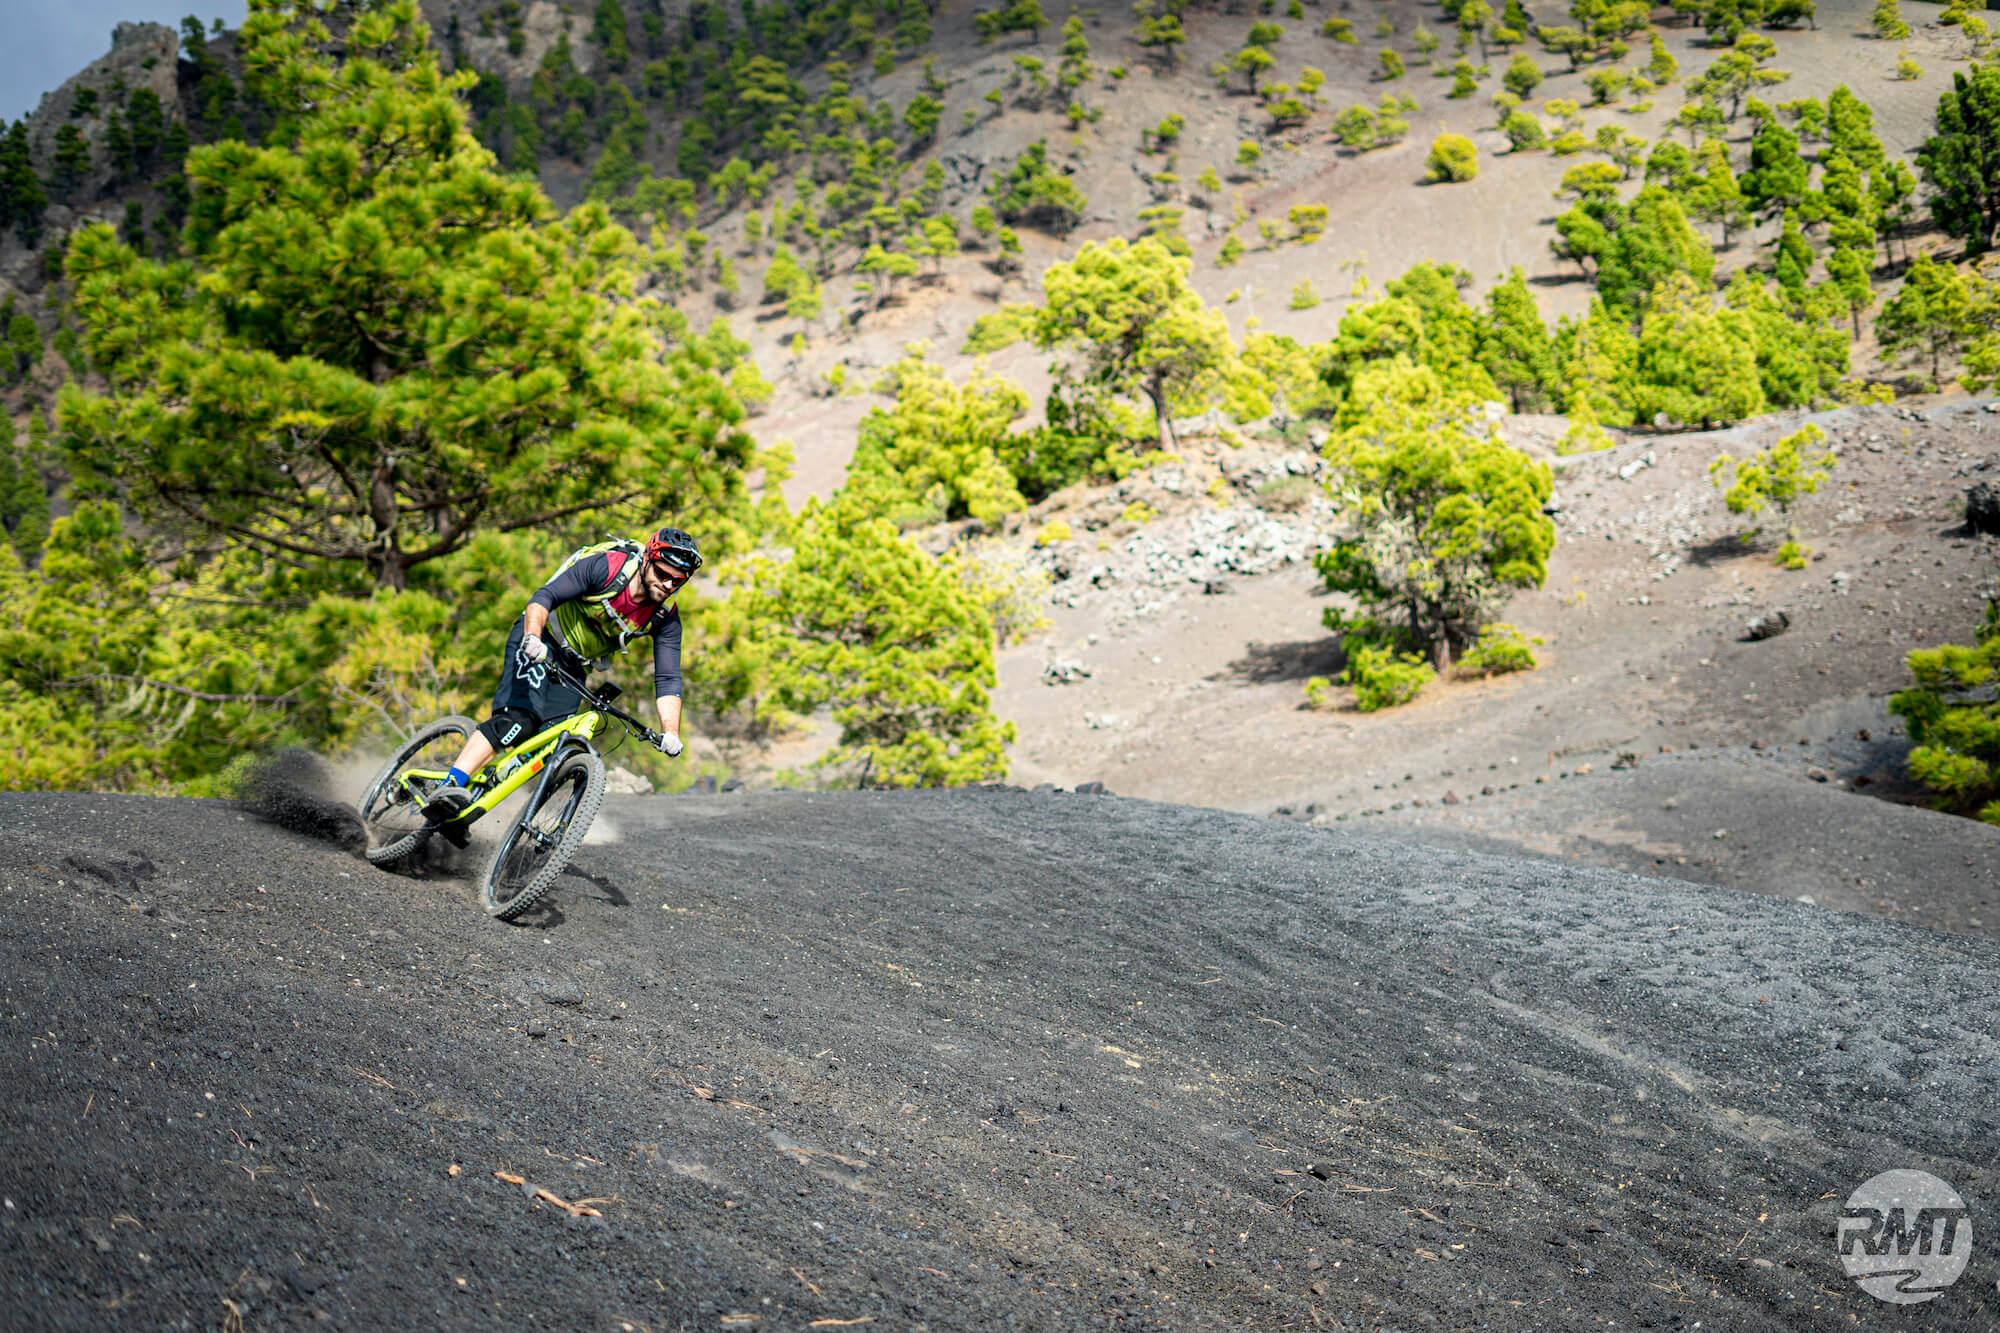 MTB-Trail-Urlaub-auf-La-Palma-Rock-my-Trail-Bikeschule-Reise-25